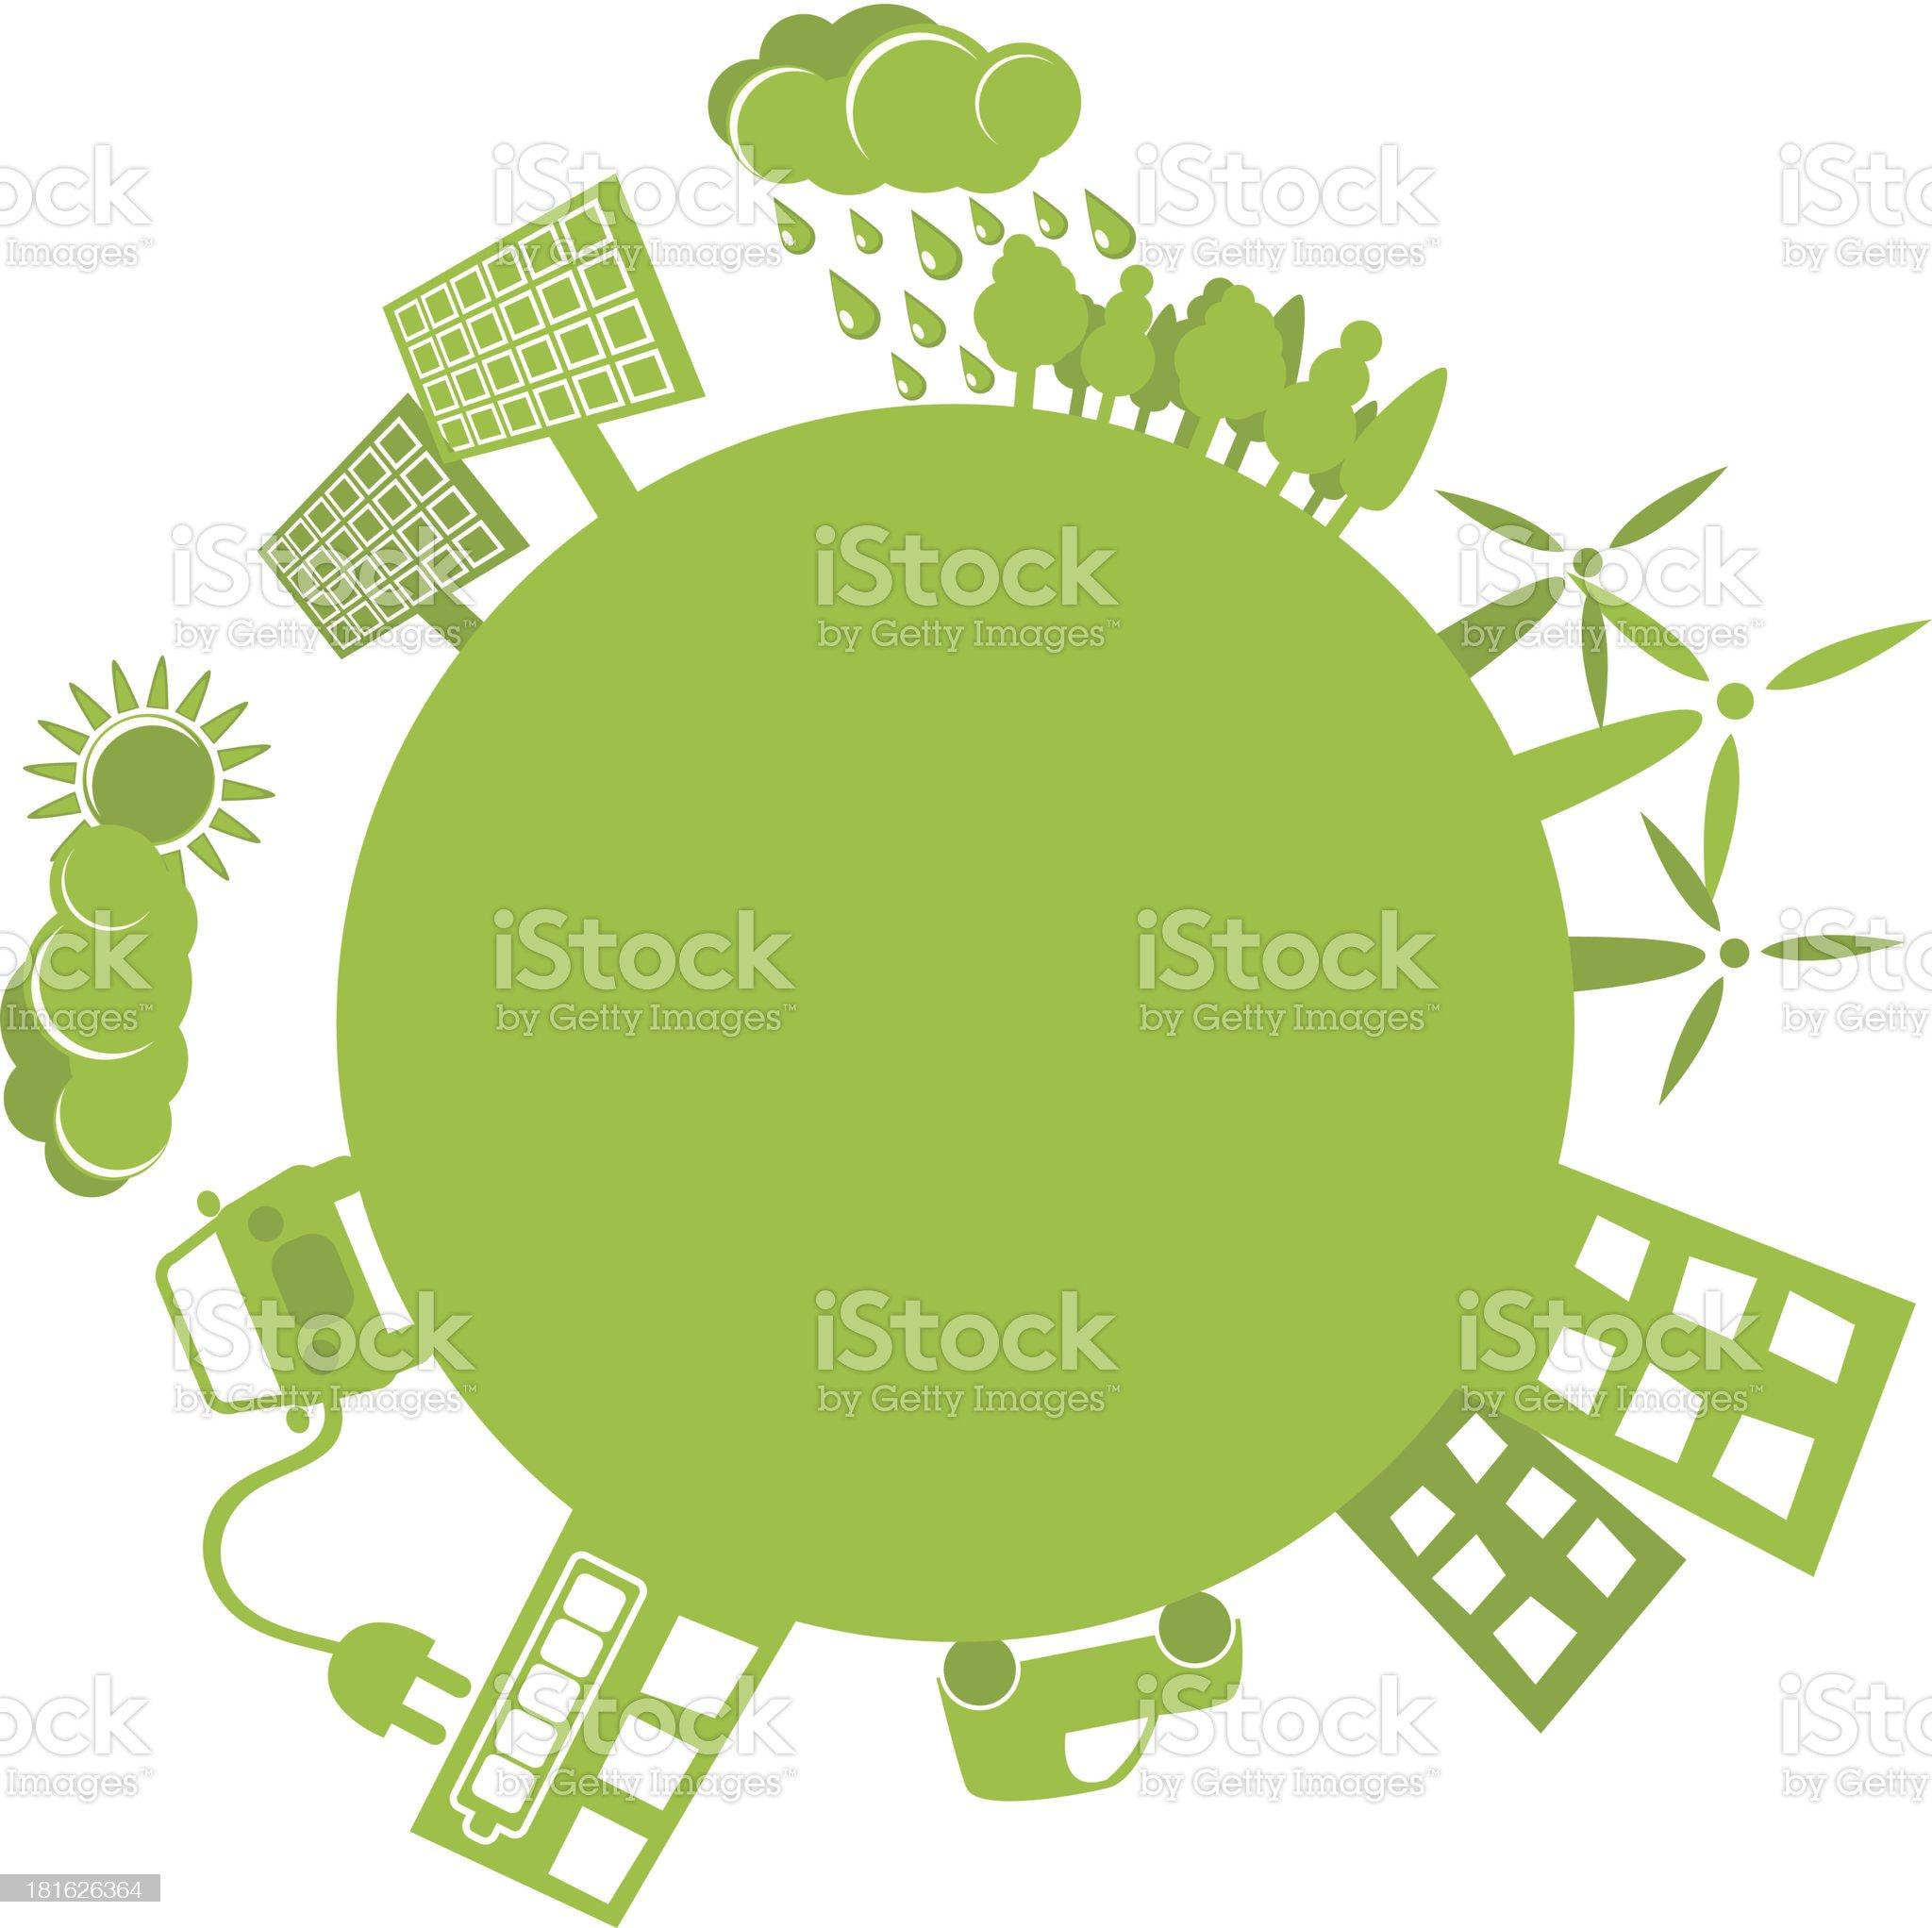 Green planet simple logo royalty-free stock vector art